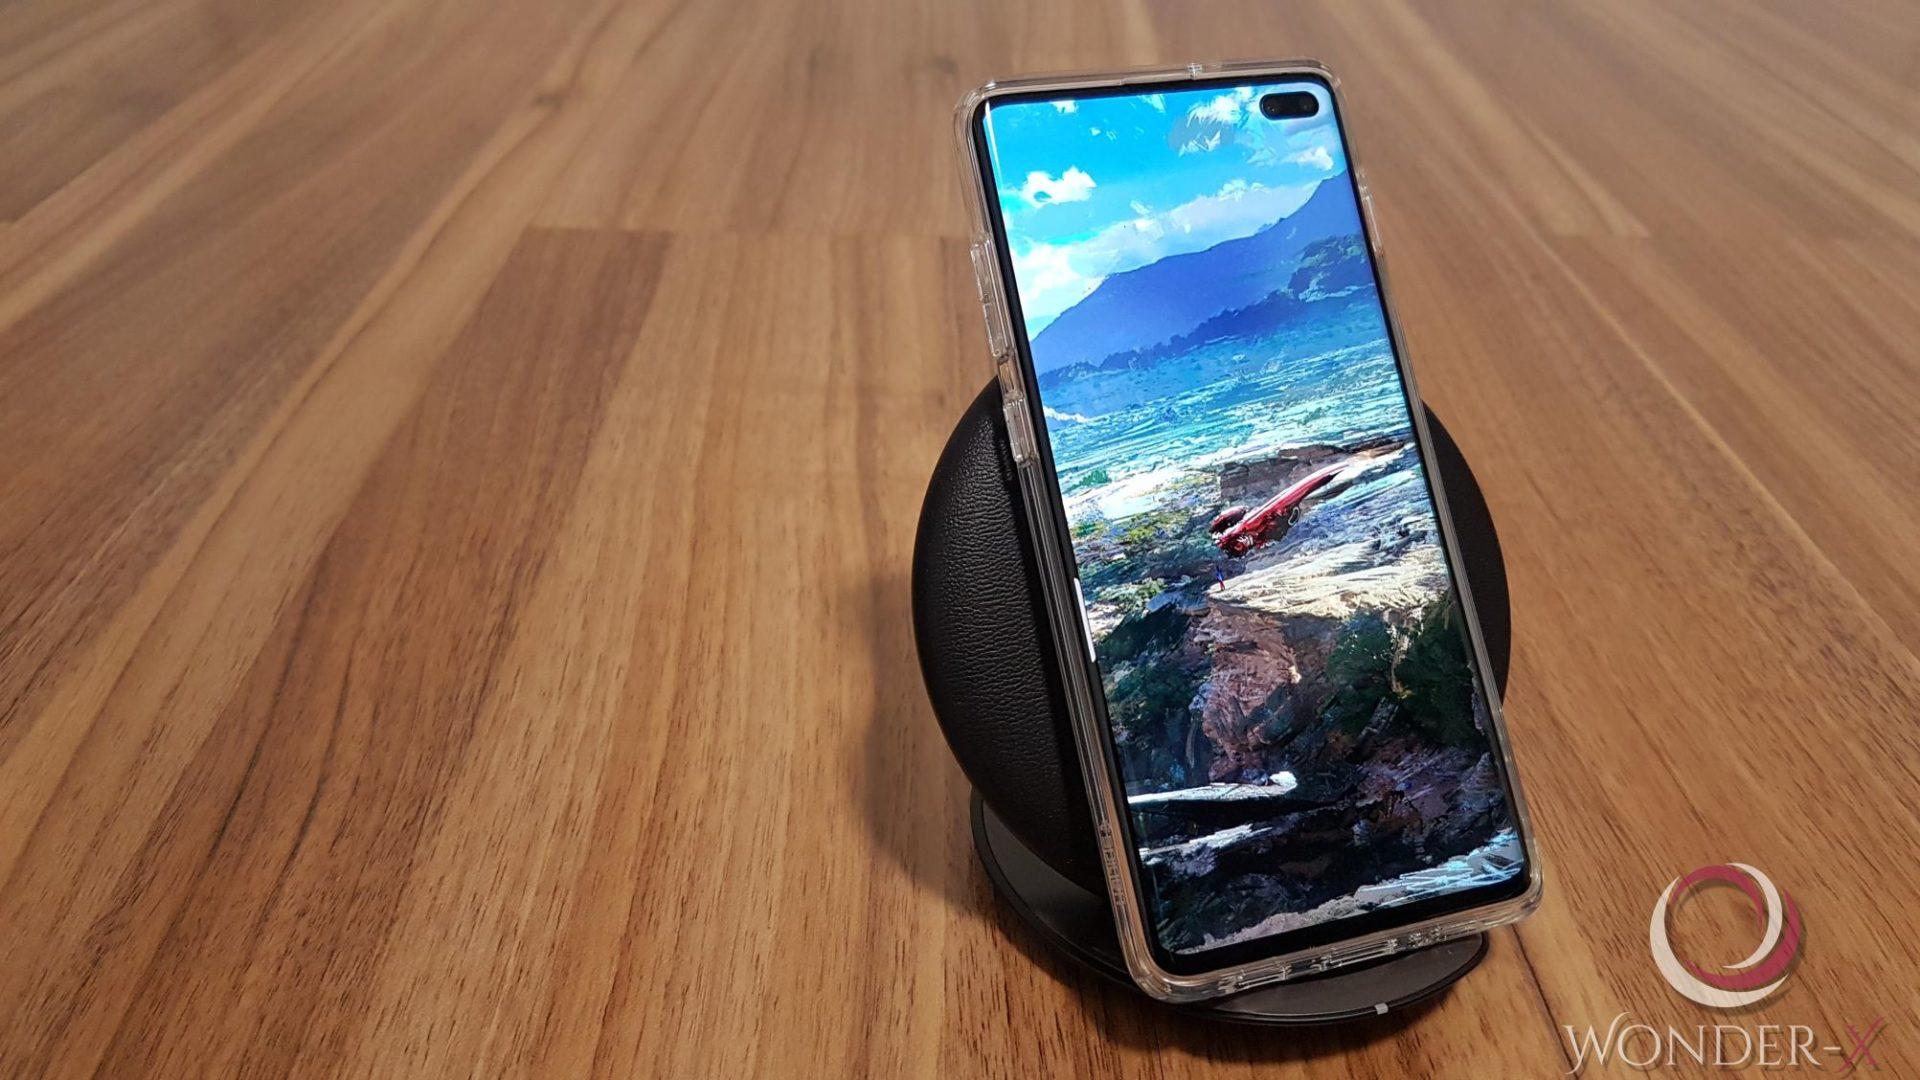 「Galaxy S10/Note10」等のスマホで画面の向きを固定する方法を超簡単に紹介